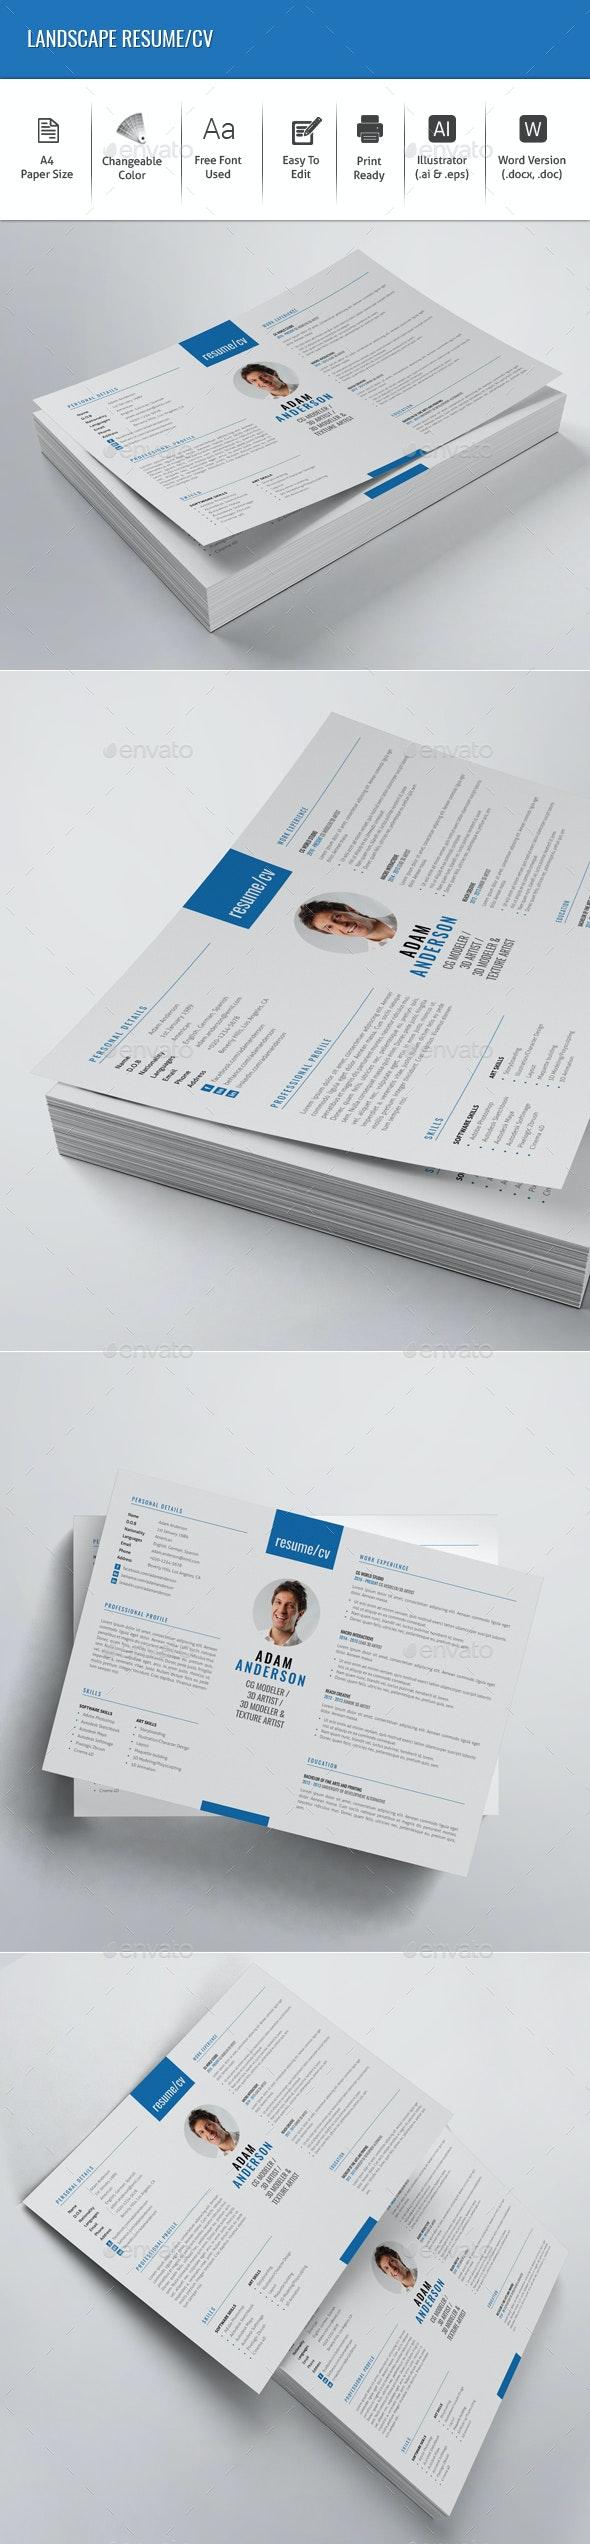 Landscape Resume/CV - Resumes Stationery